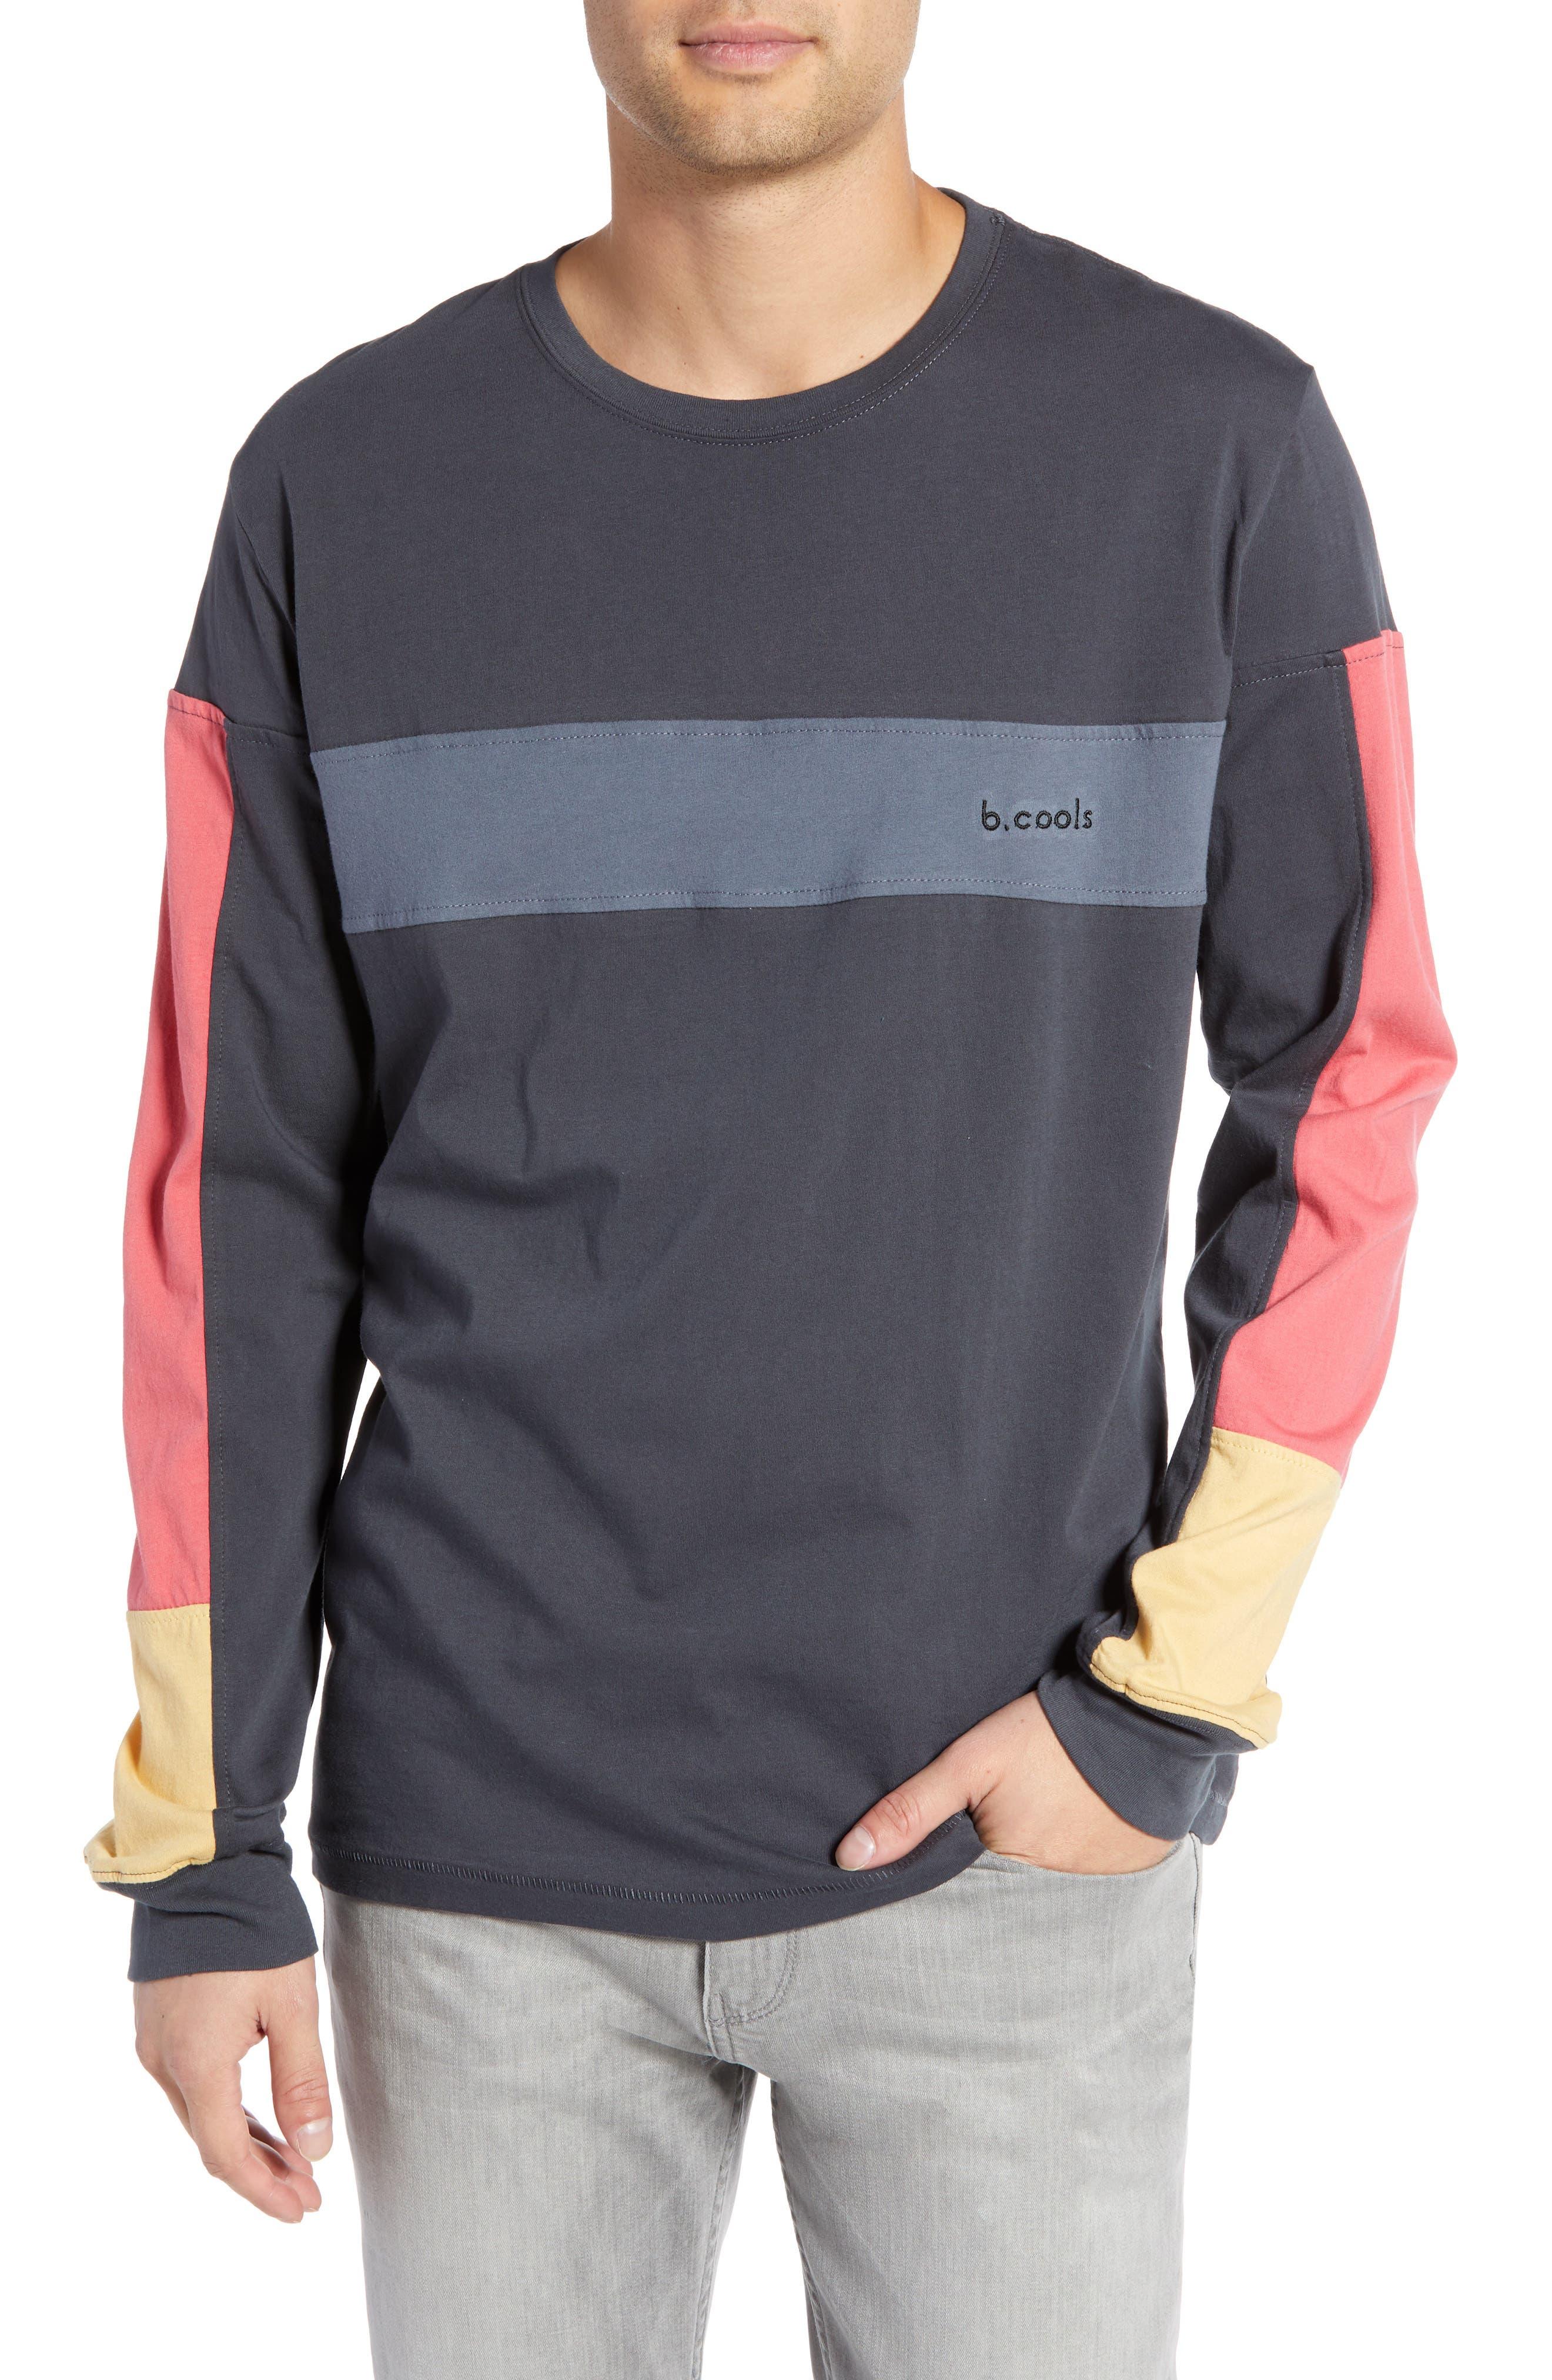 BARNEY COOLS,                             B Quick Colorblock Long Sleeve T-Shirt,                             Main thumbnail 1, color,                             001